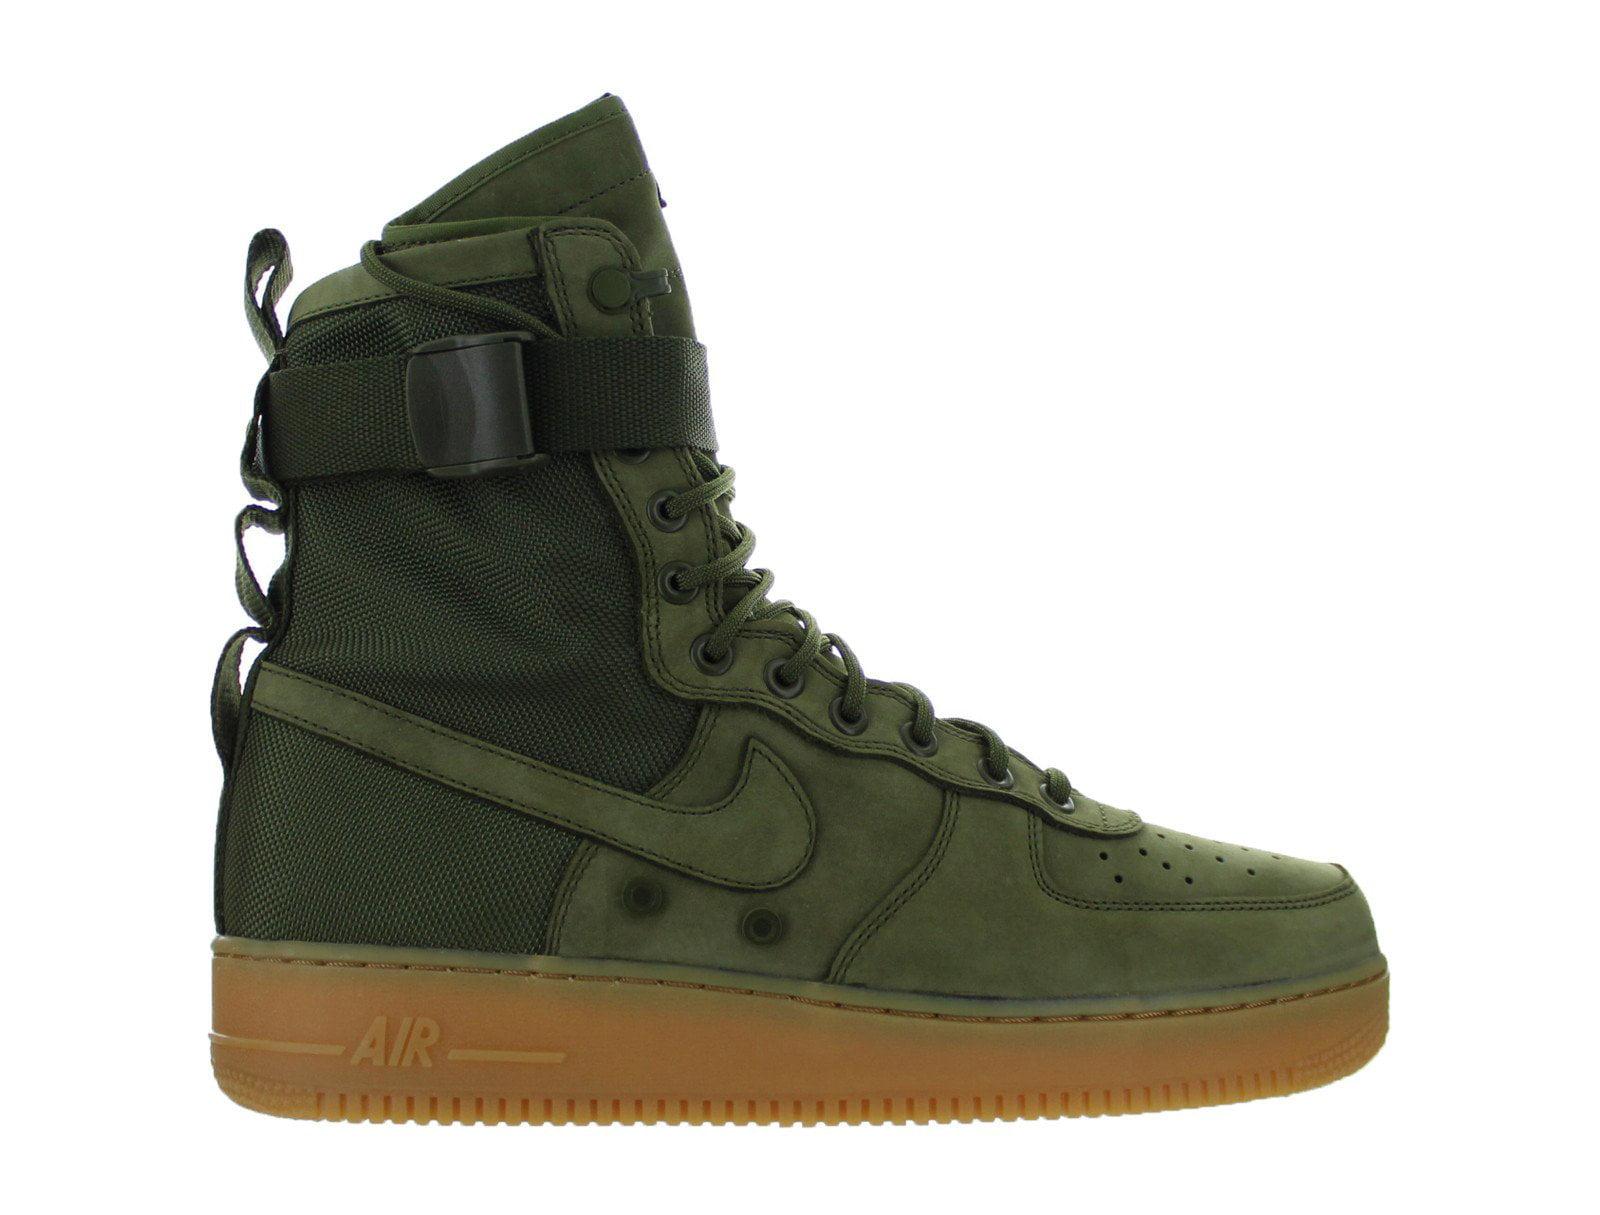 Mens Nike Special Field SF Air Force 1